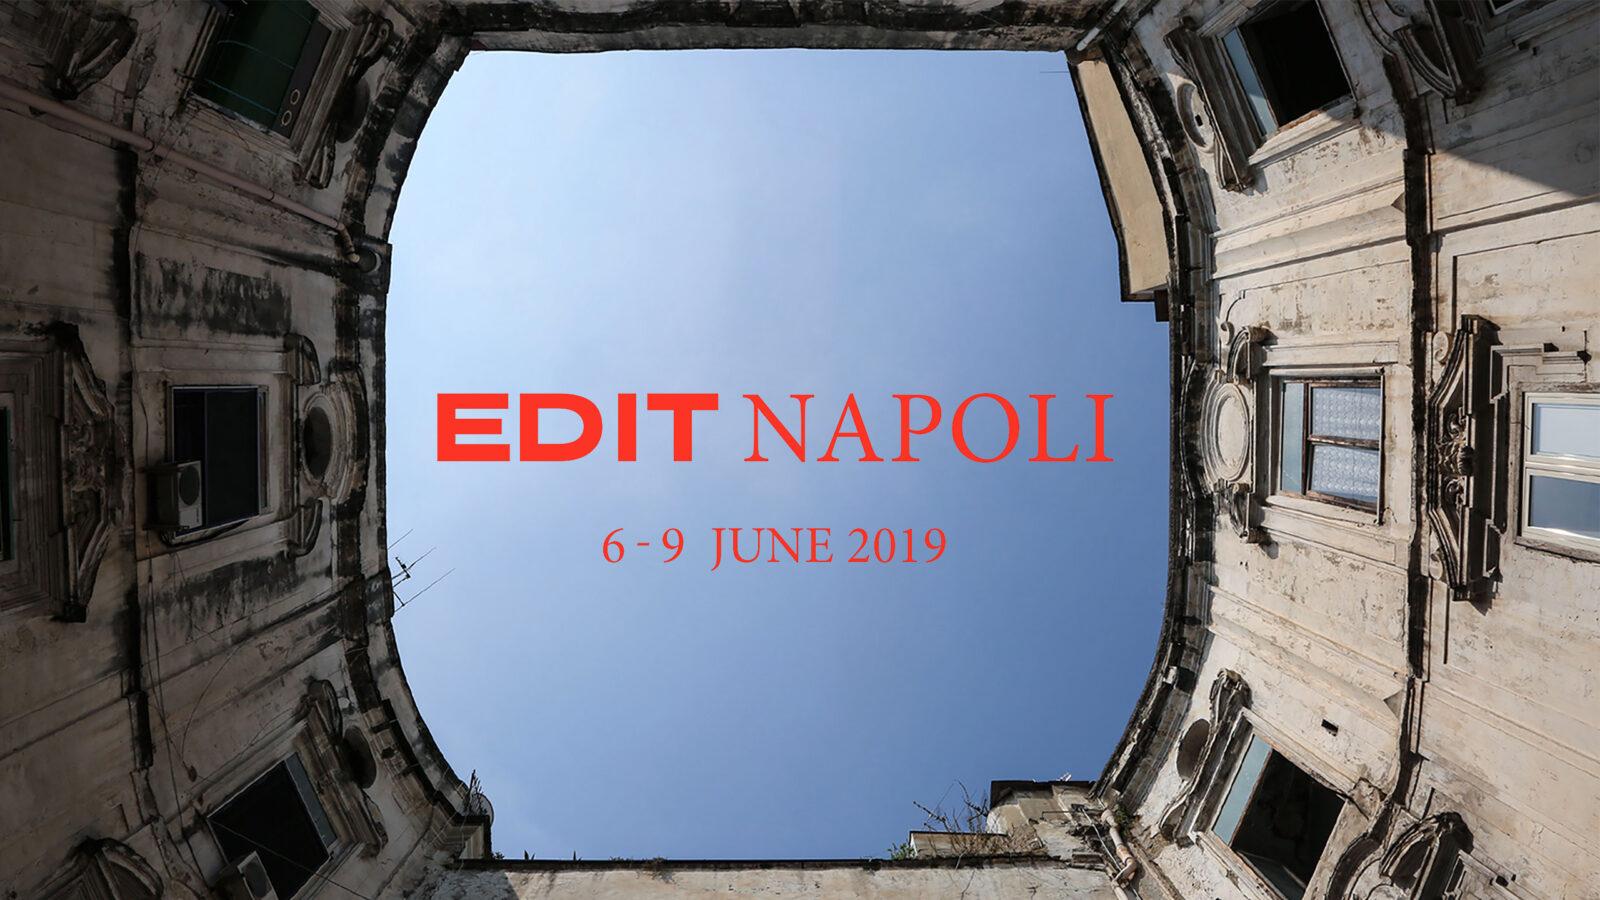 DE CASTELLI がEDIT NAPOLI に出展